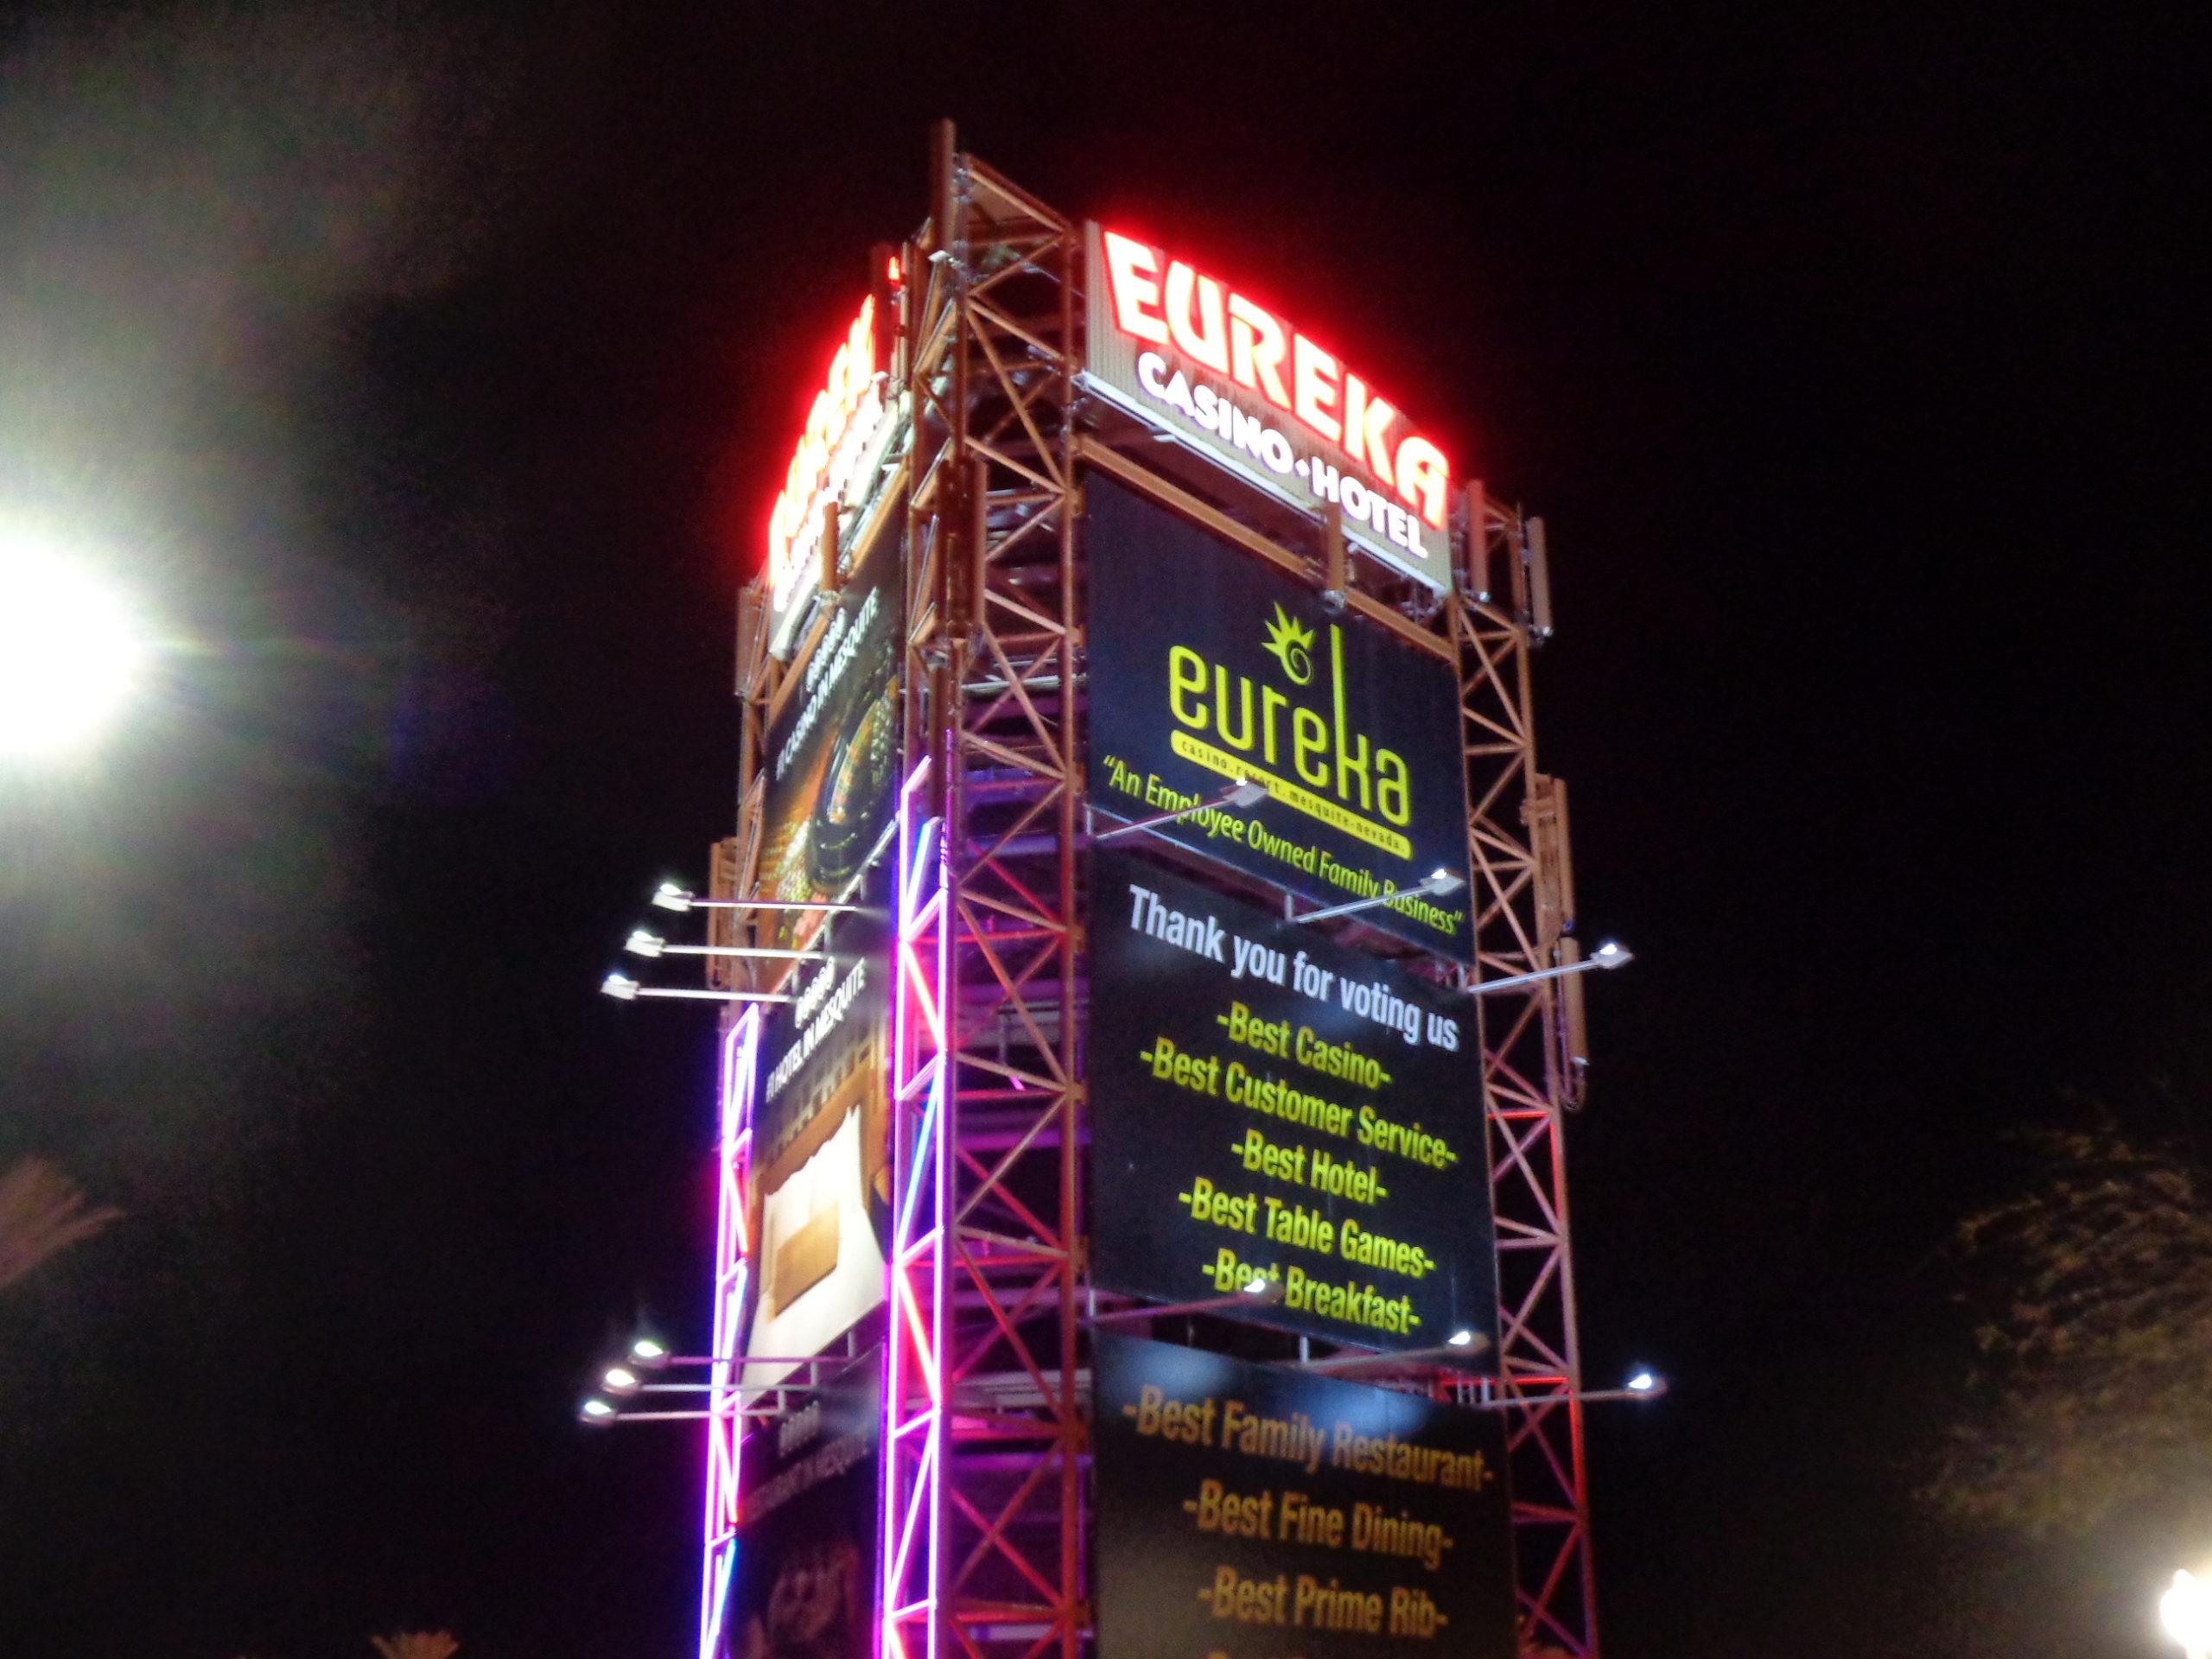 Eureka hotel x26 casino vinosia salento malvasia bianca igt